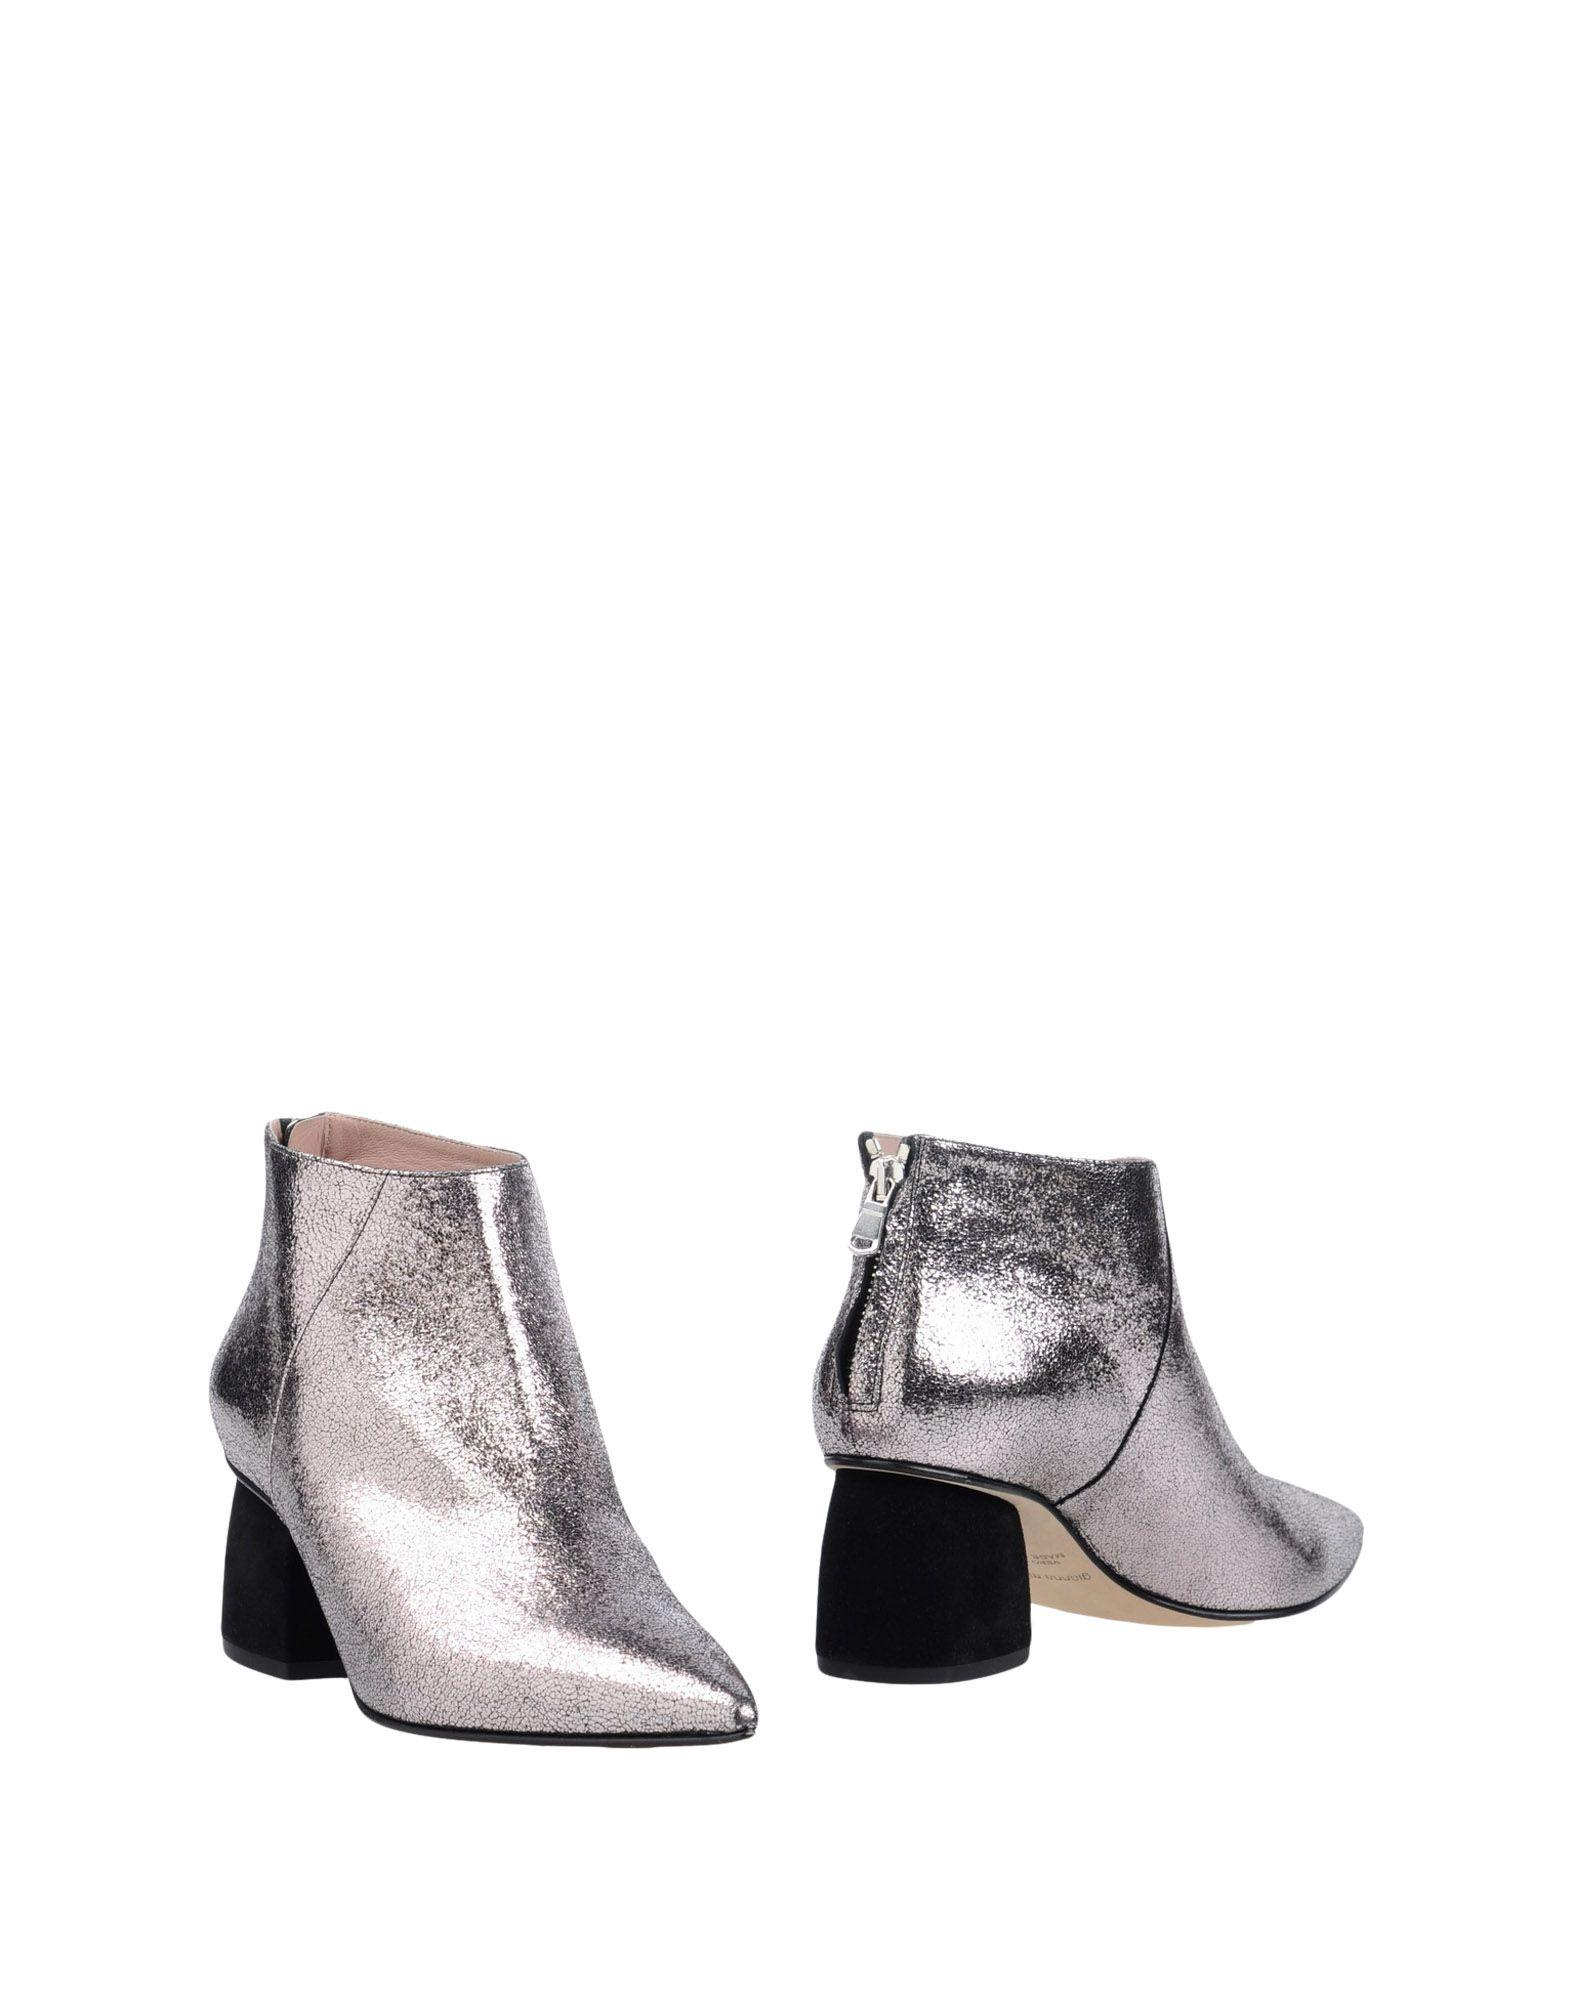 gianna meliani босоножки на платформе GIANNA MELIANI Полусапоги и высокие ботинки